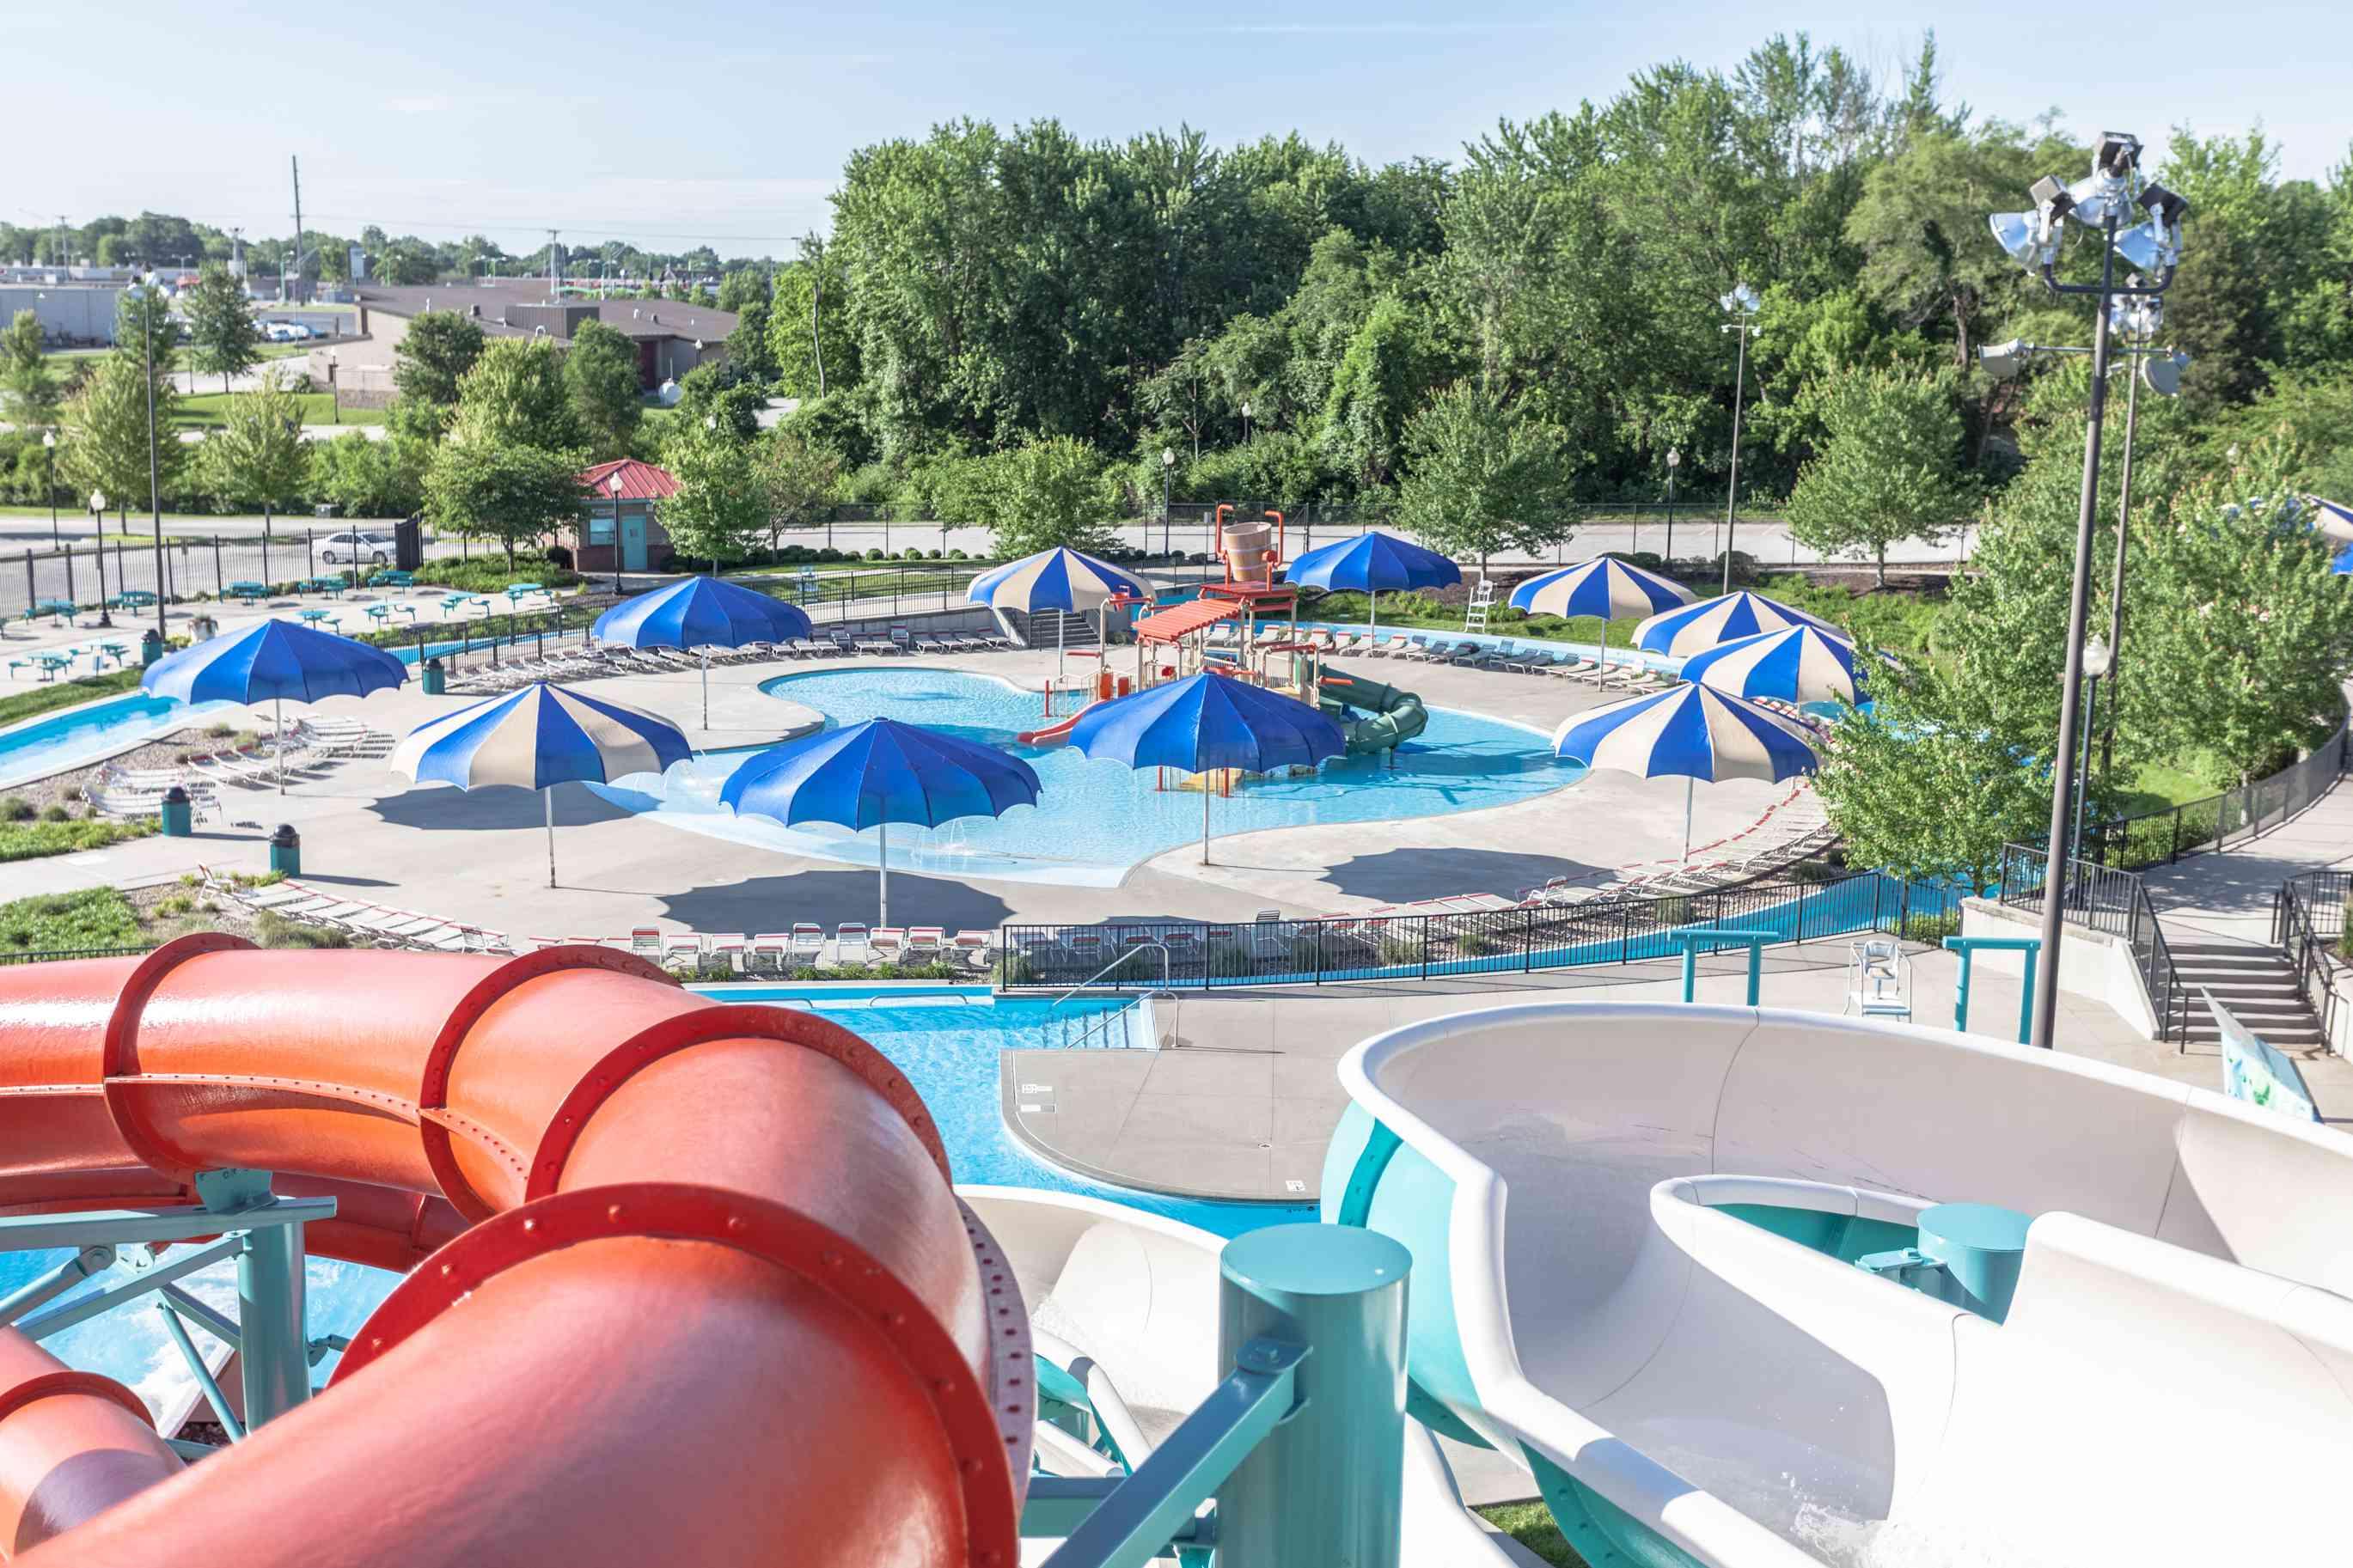 Adventure Oasis water park in Missouri